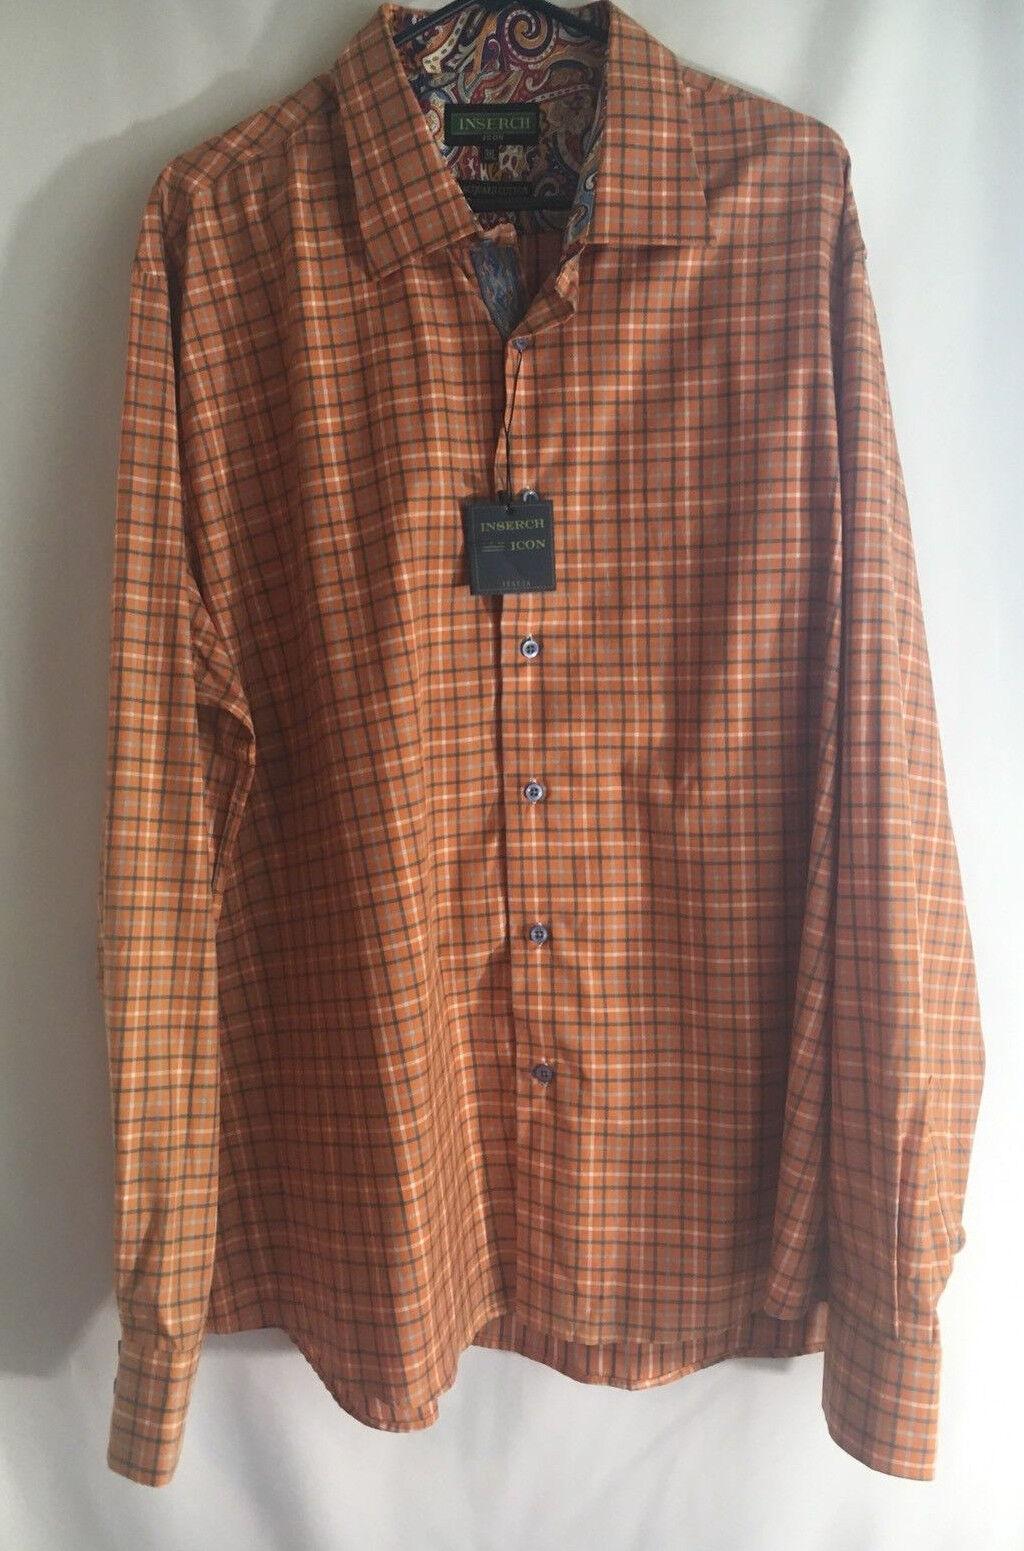 INSERCH Mens orange Plaid Long Sleeve Dress Casual Shirt size 3XL XXXL 58  Chest